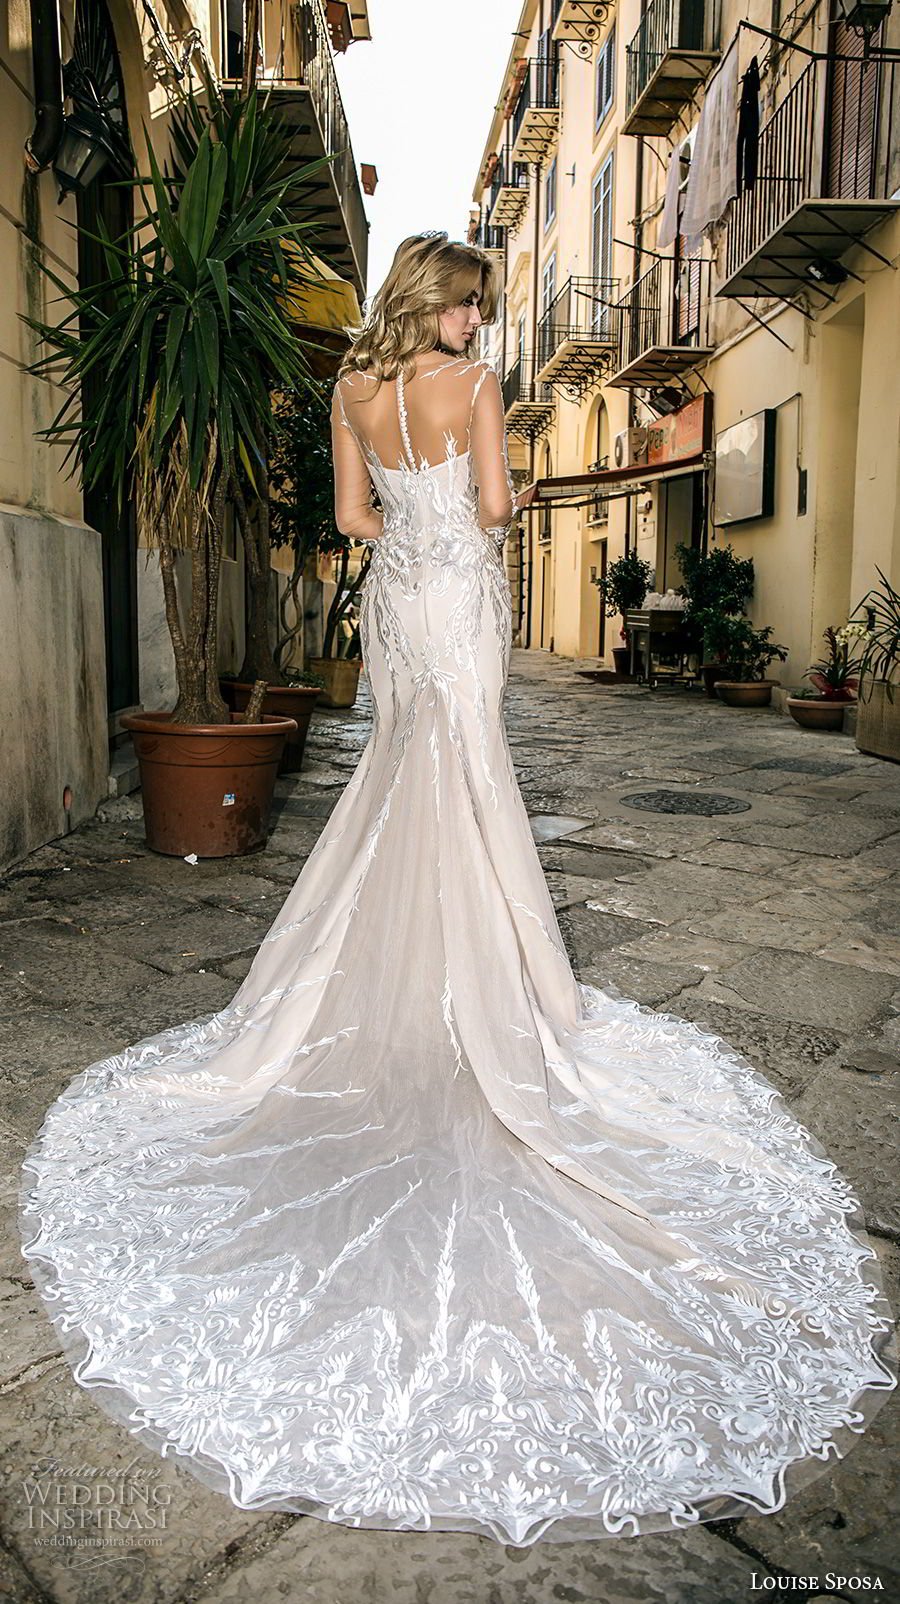 louise sposa 2018 bridal long sleeves illusion bateau sweetheart neckline full embellishment elegant fit and flare wedding dress sheer button back chapel train (23) bv